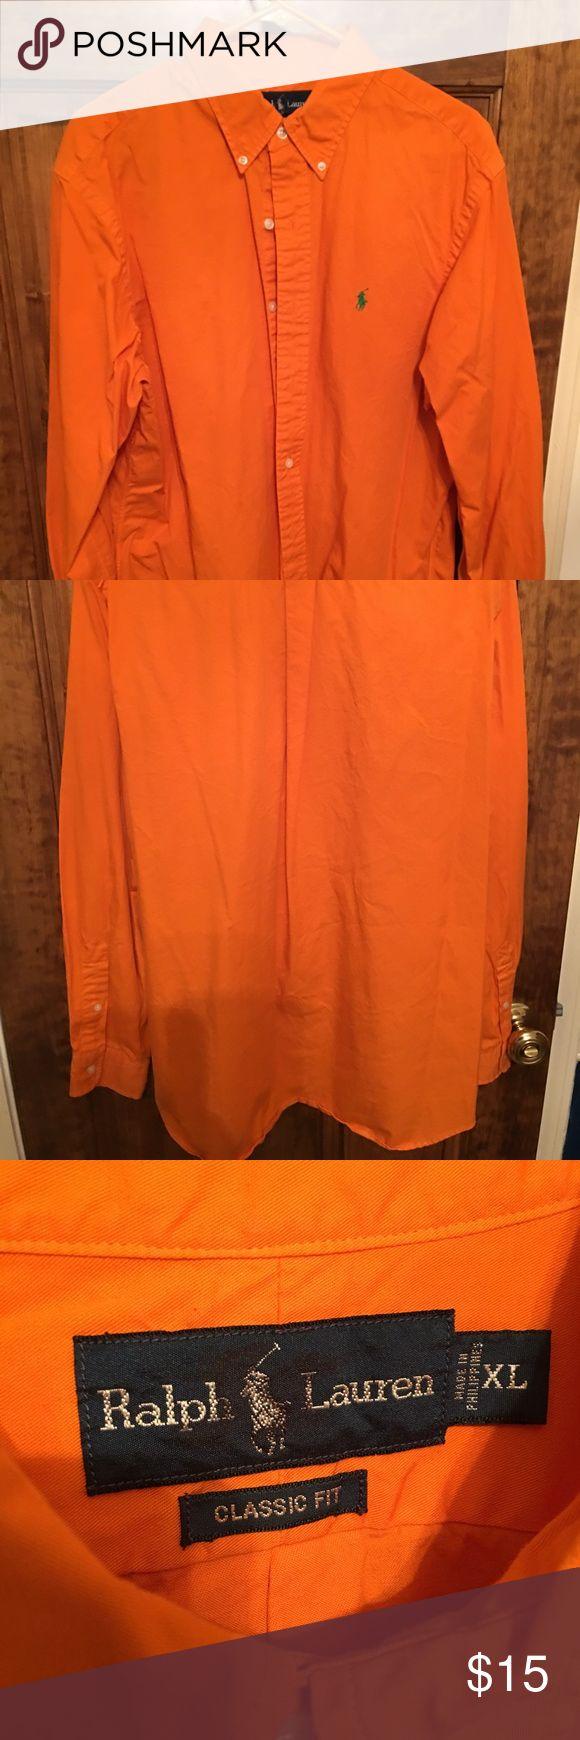 Long sleeve polo button down Orange long sleeve polo button down shirt. Size XL Polo by Ralph Lauren Shirts Casual Button Down Shirts